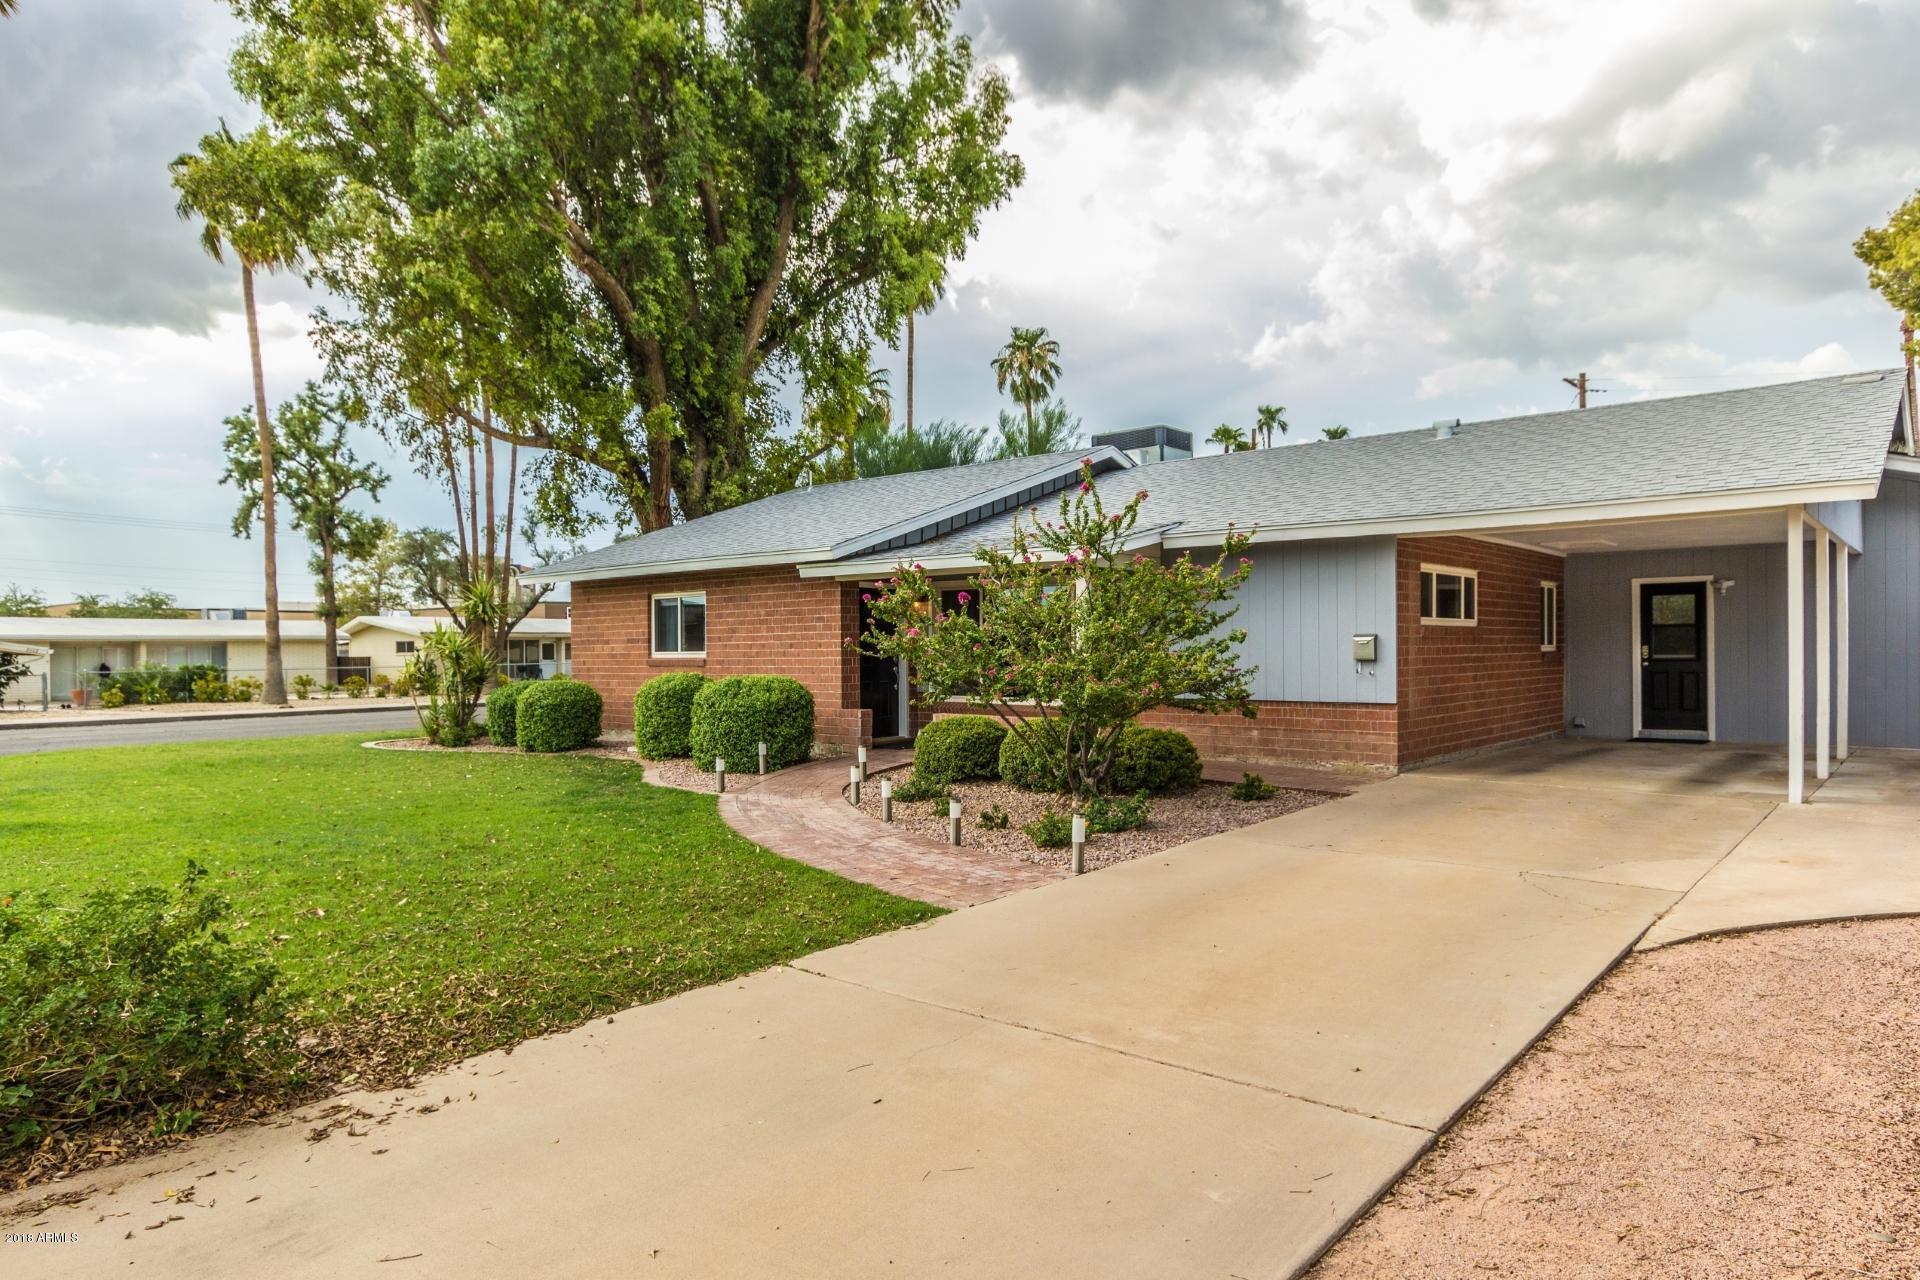 Photo for 4602 E Virginia Avenue, Phoenix, AZ 85008 (MLS # 5808420)